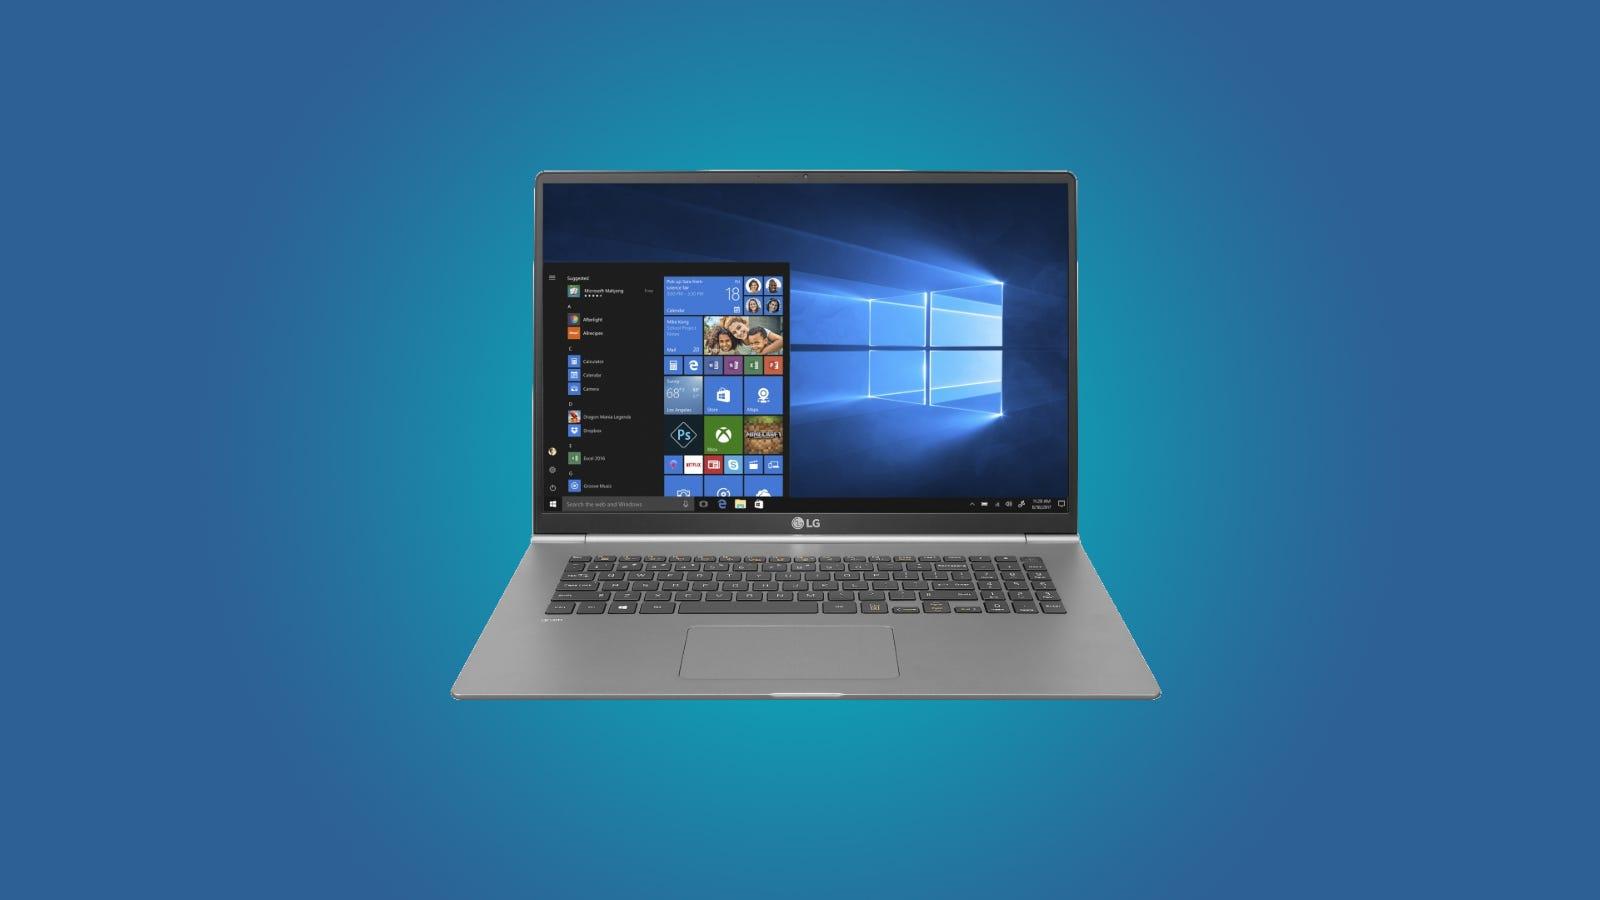 LG gram 17 Review  The Lightest 17-inch Laptop Around – Review Geek 33c34d8e5494e